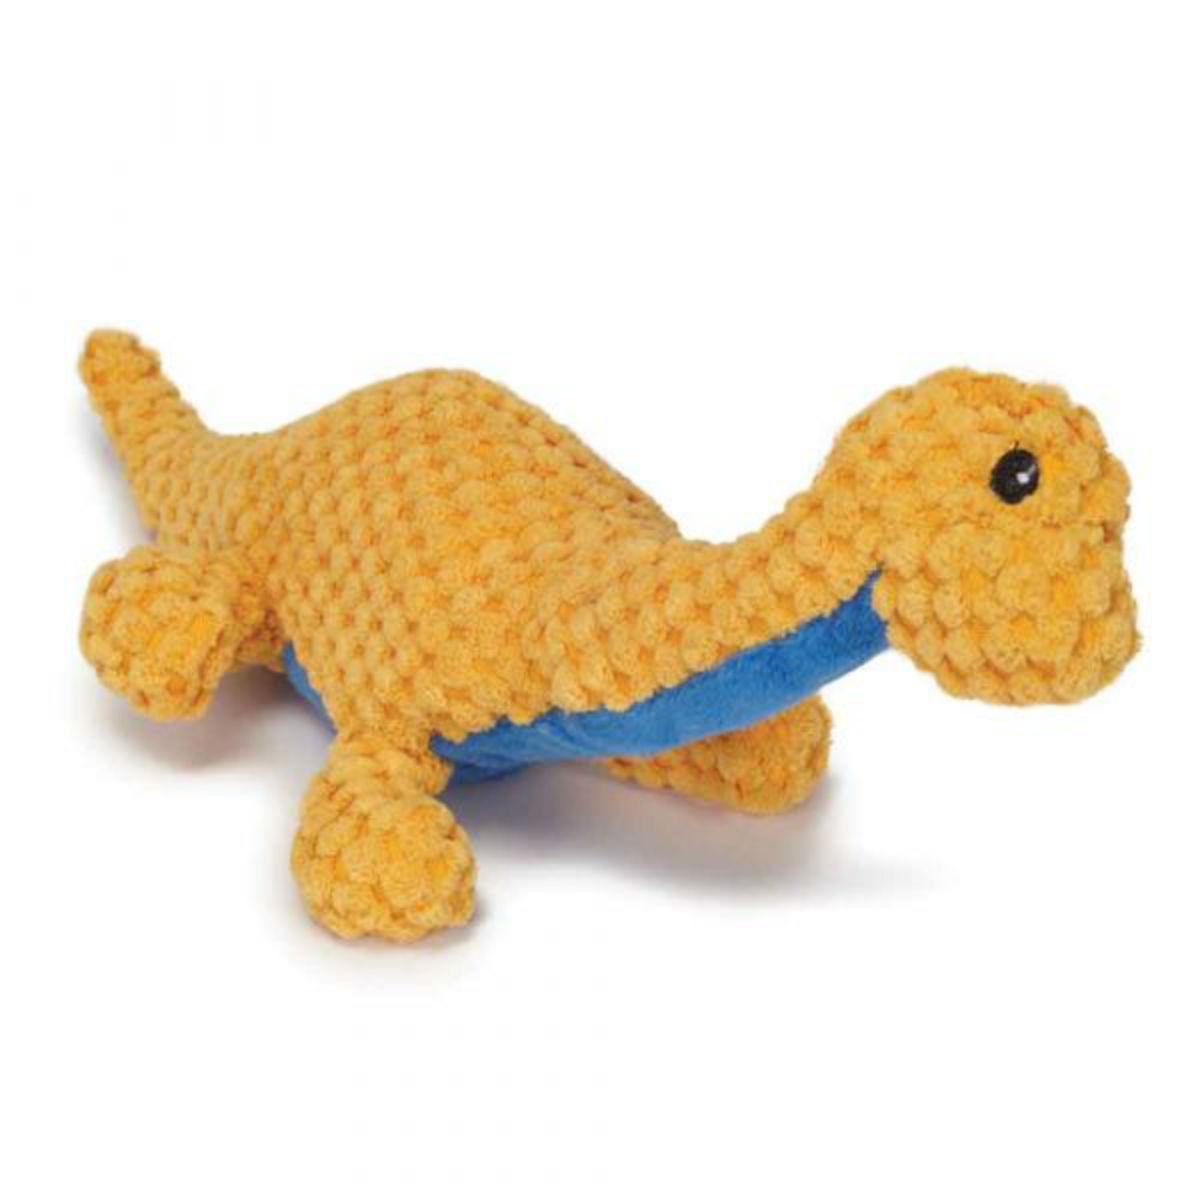 Play 365 Jurassic Cord Crew Brachiosaur Dog Toy - Orange